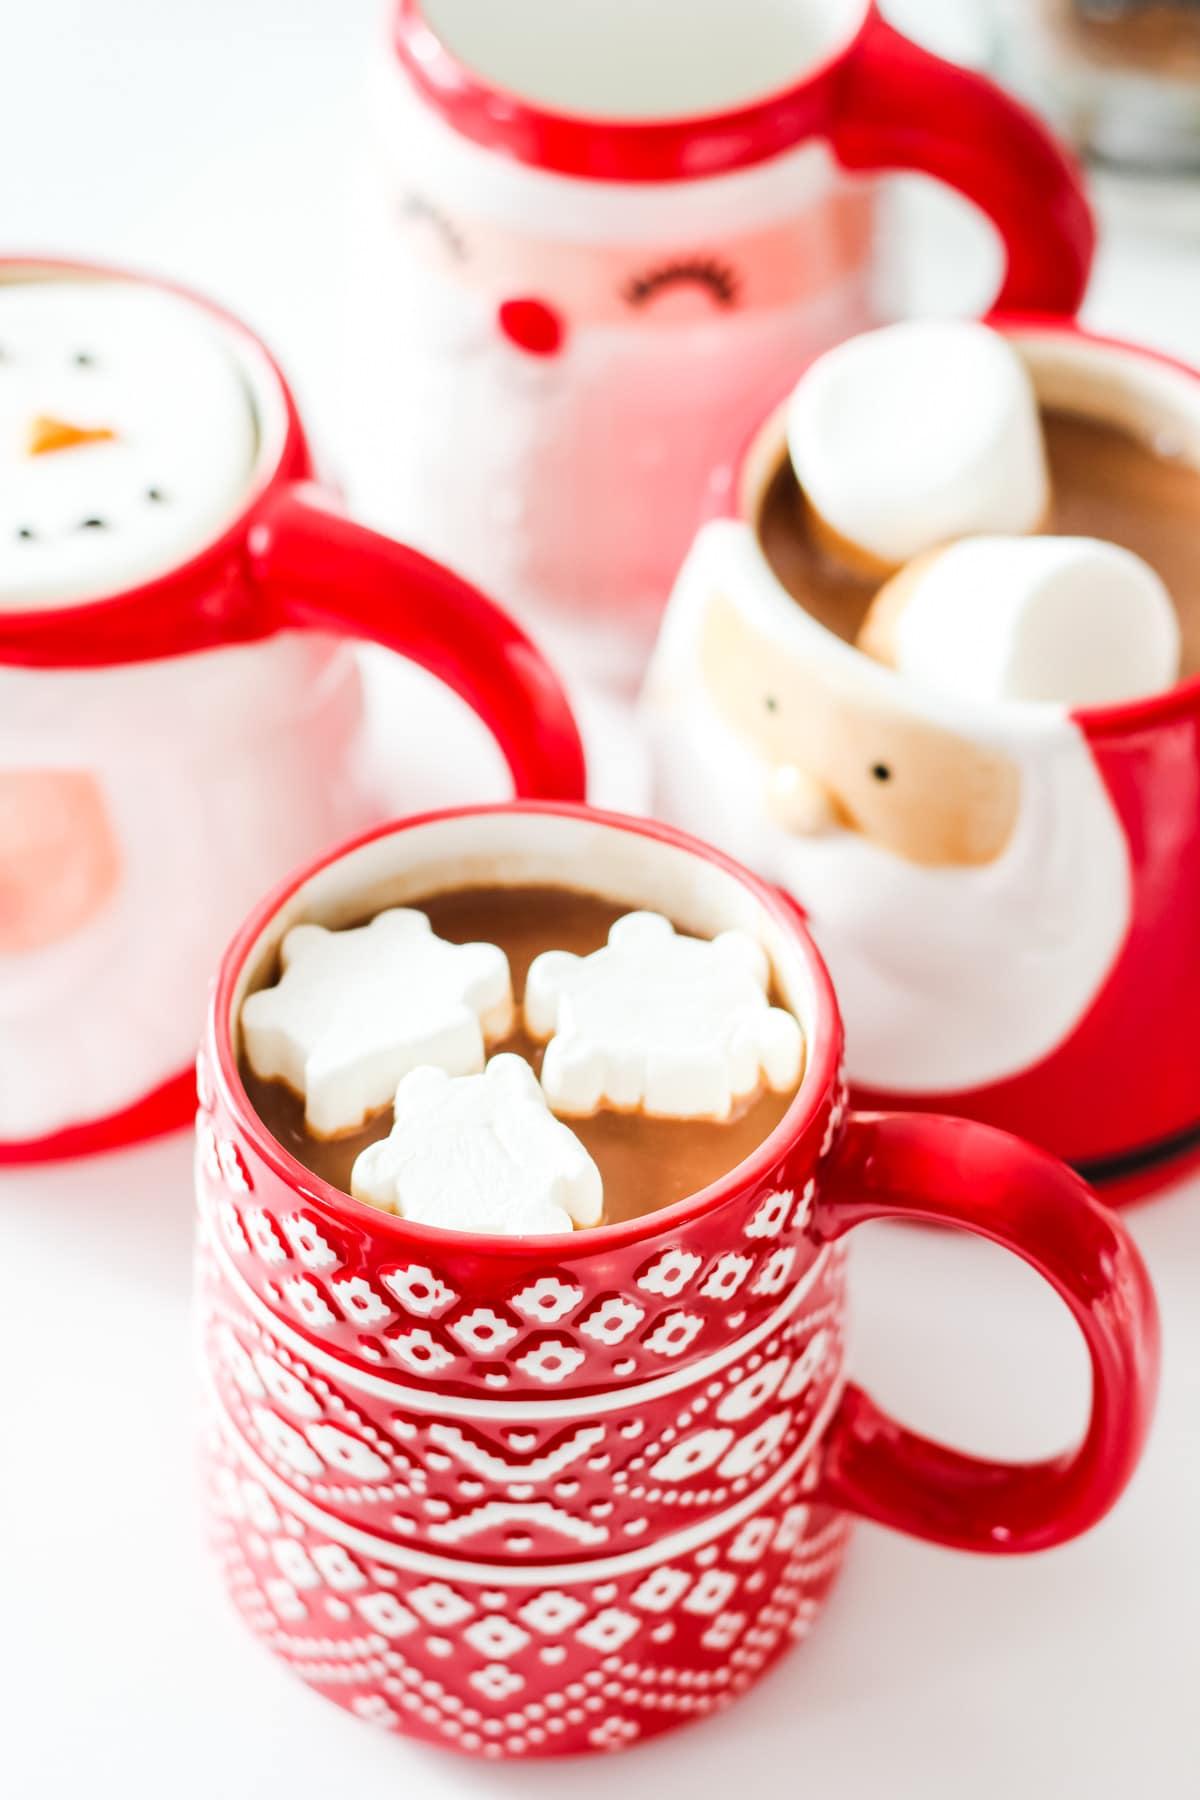 A mug of hot chocolate and snowflake marshmallows